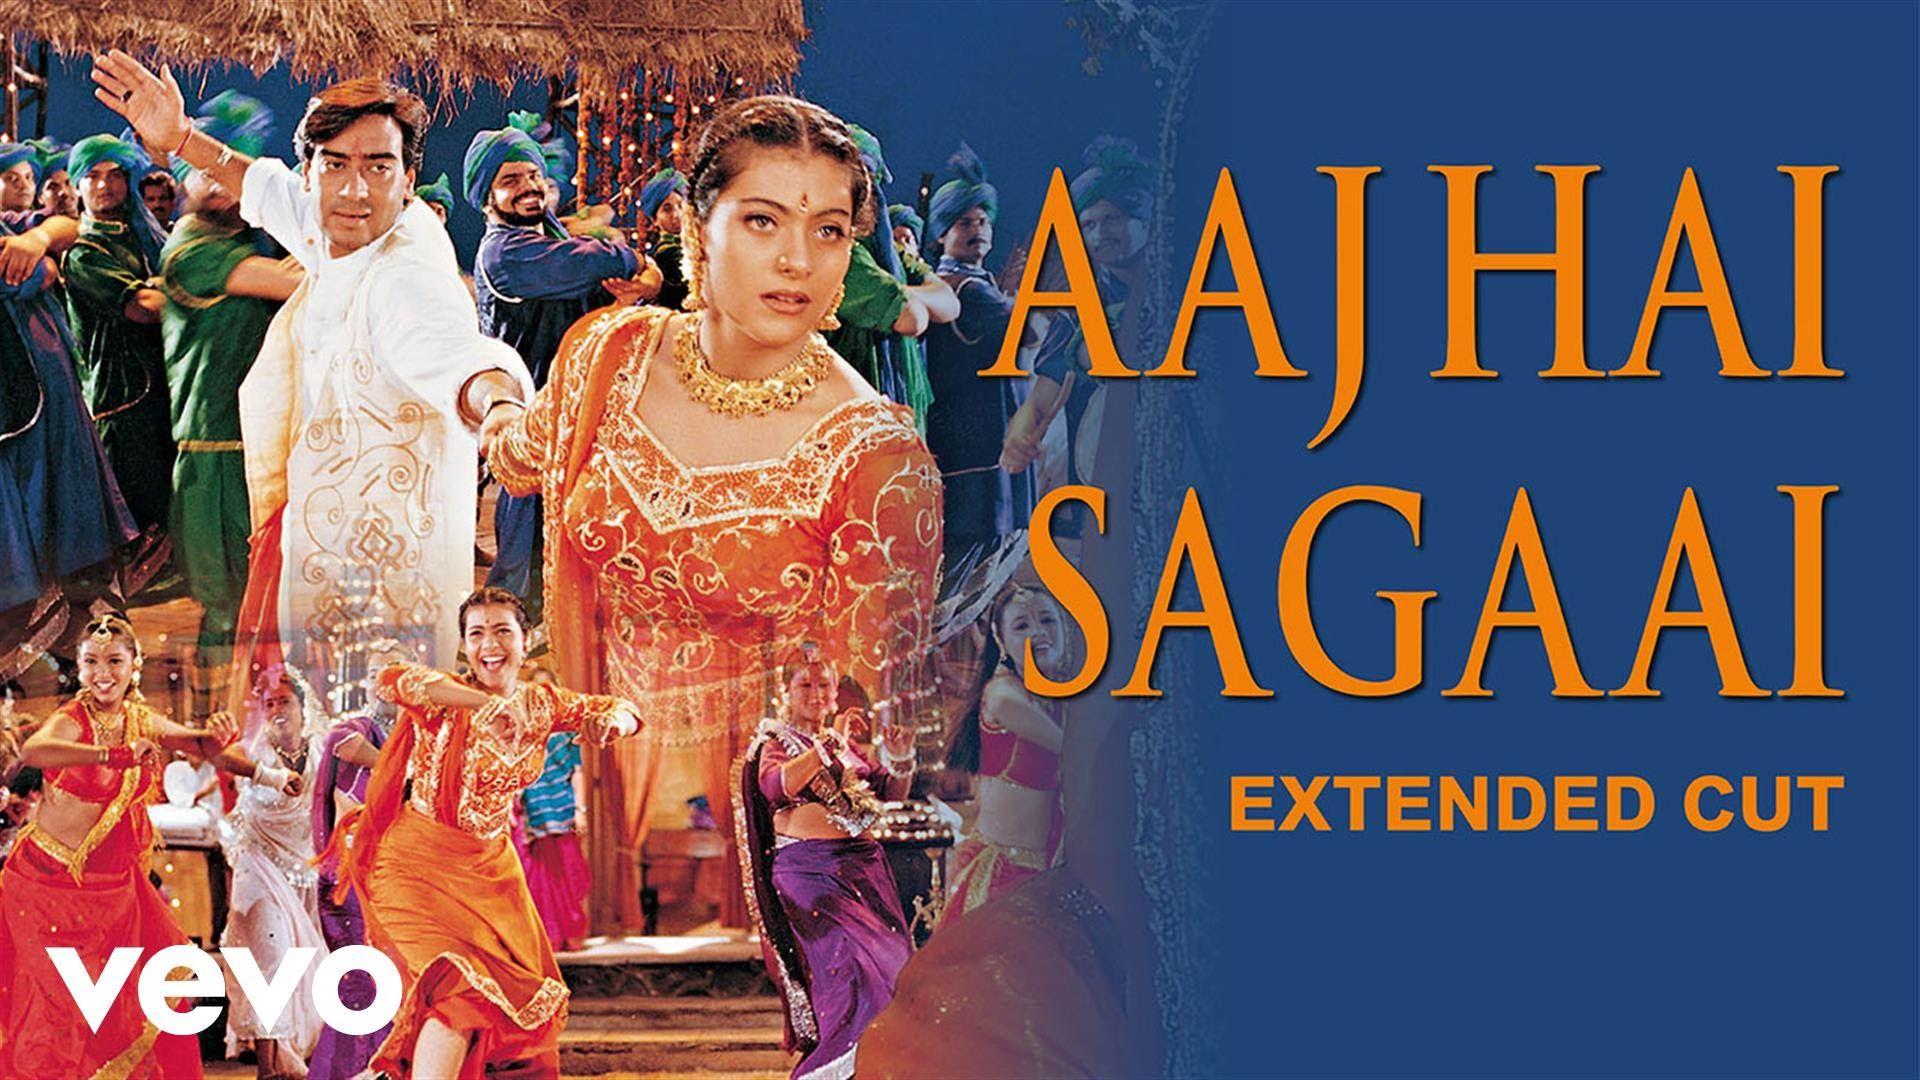 Pyaar To Hona Hi Tha Kajol Ajay Devgan Aaj Hai Sagaai Video Celebration Song Film Movies